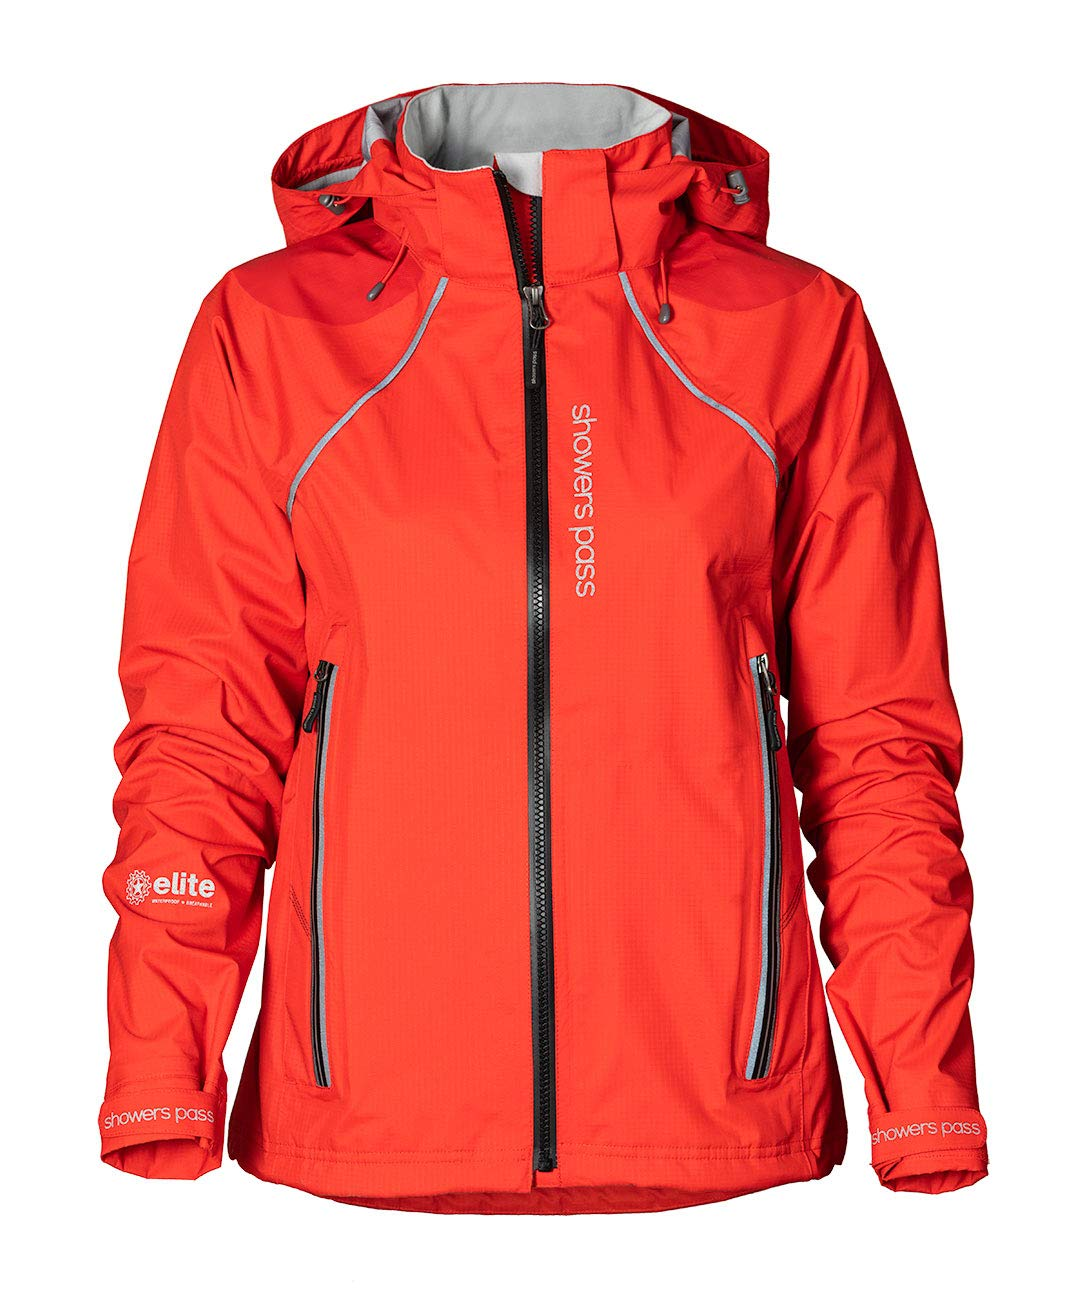 Showers Pass Refuge Jacket – Women 's XX-Large カイエン B076QXNGSP